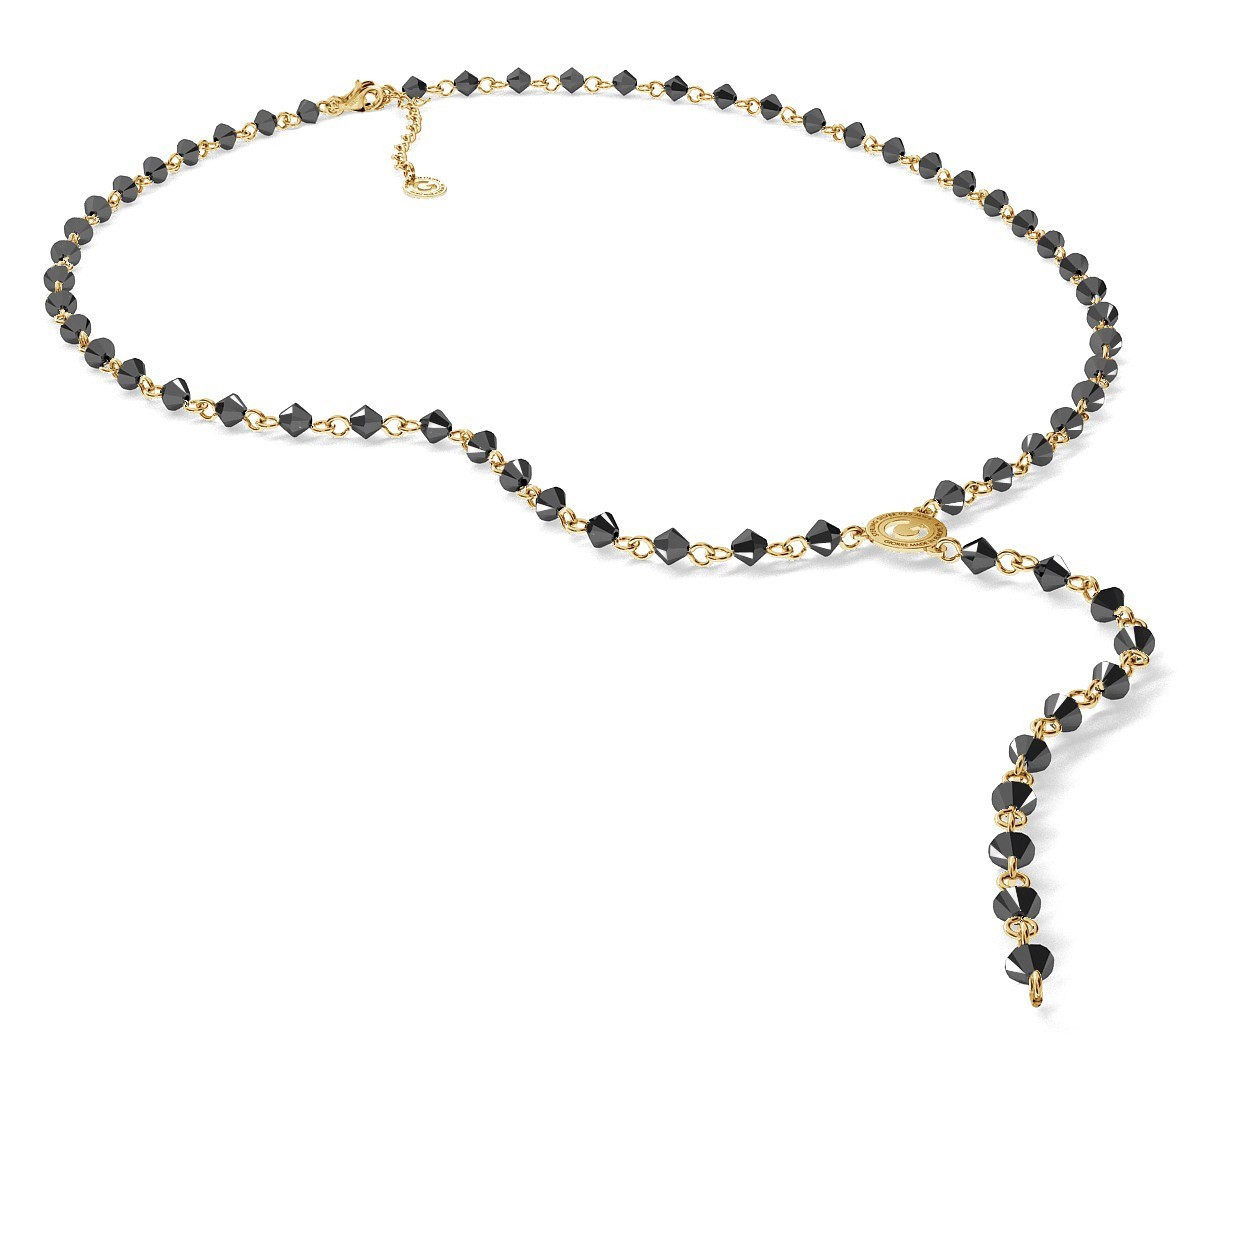 Necklace charms base with Swarovski